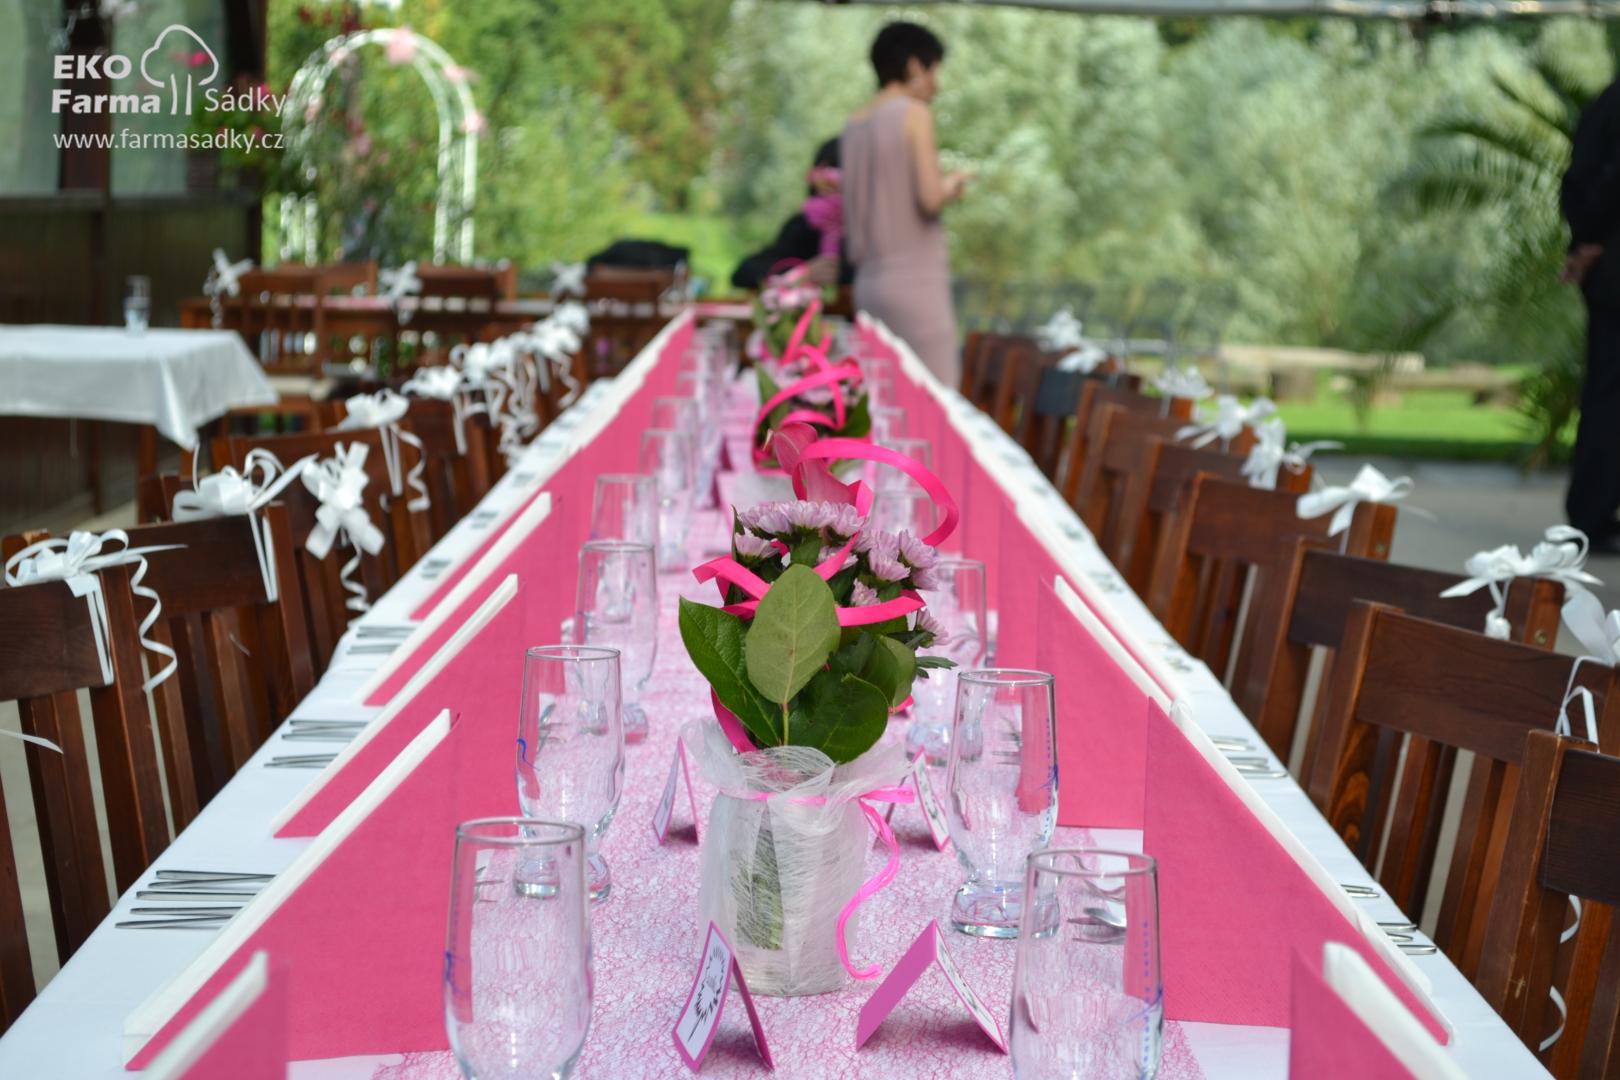 Svatba V Ruzove Barve Inspirace Agropenzion Sadky